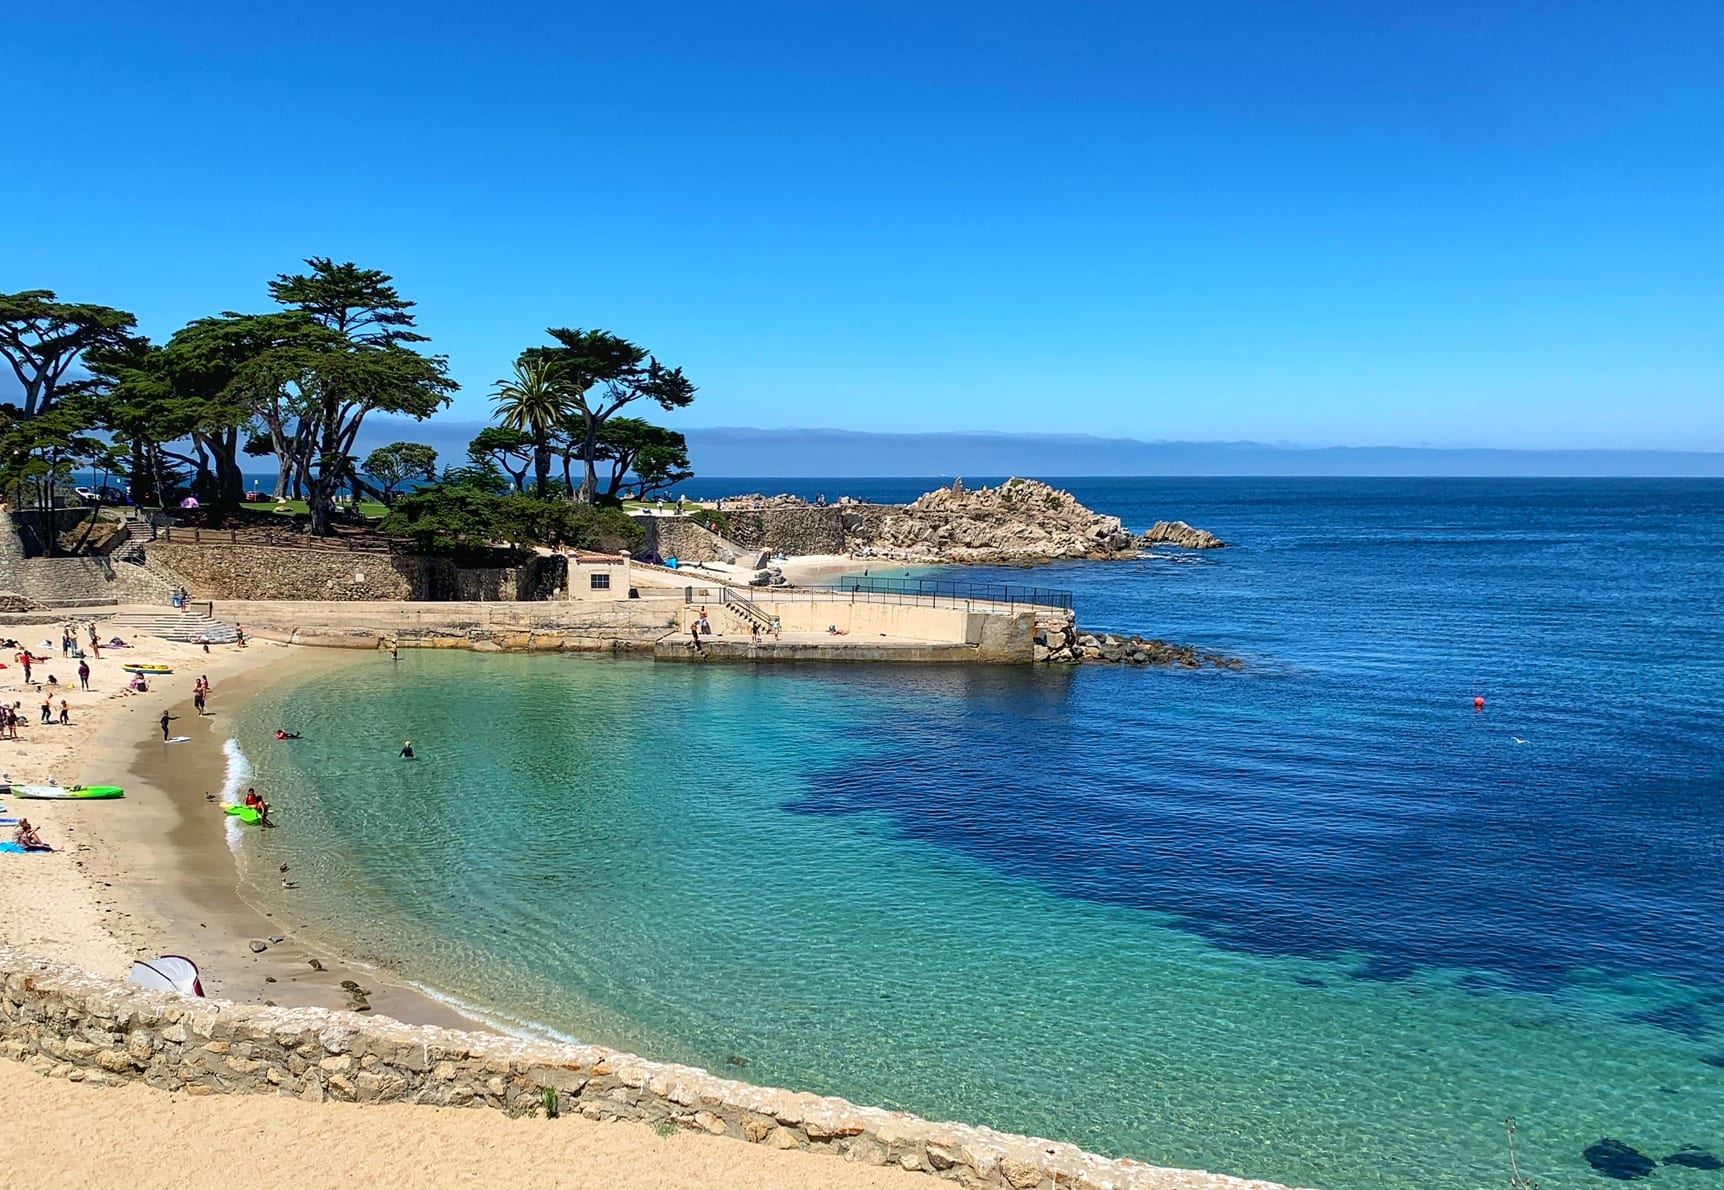 Lovers Bay Park Monterey